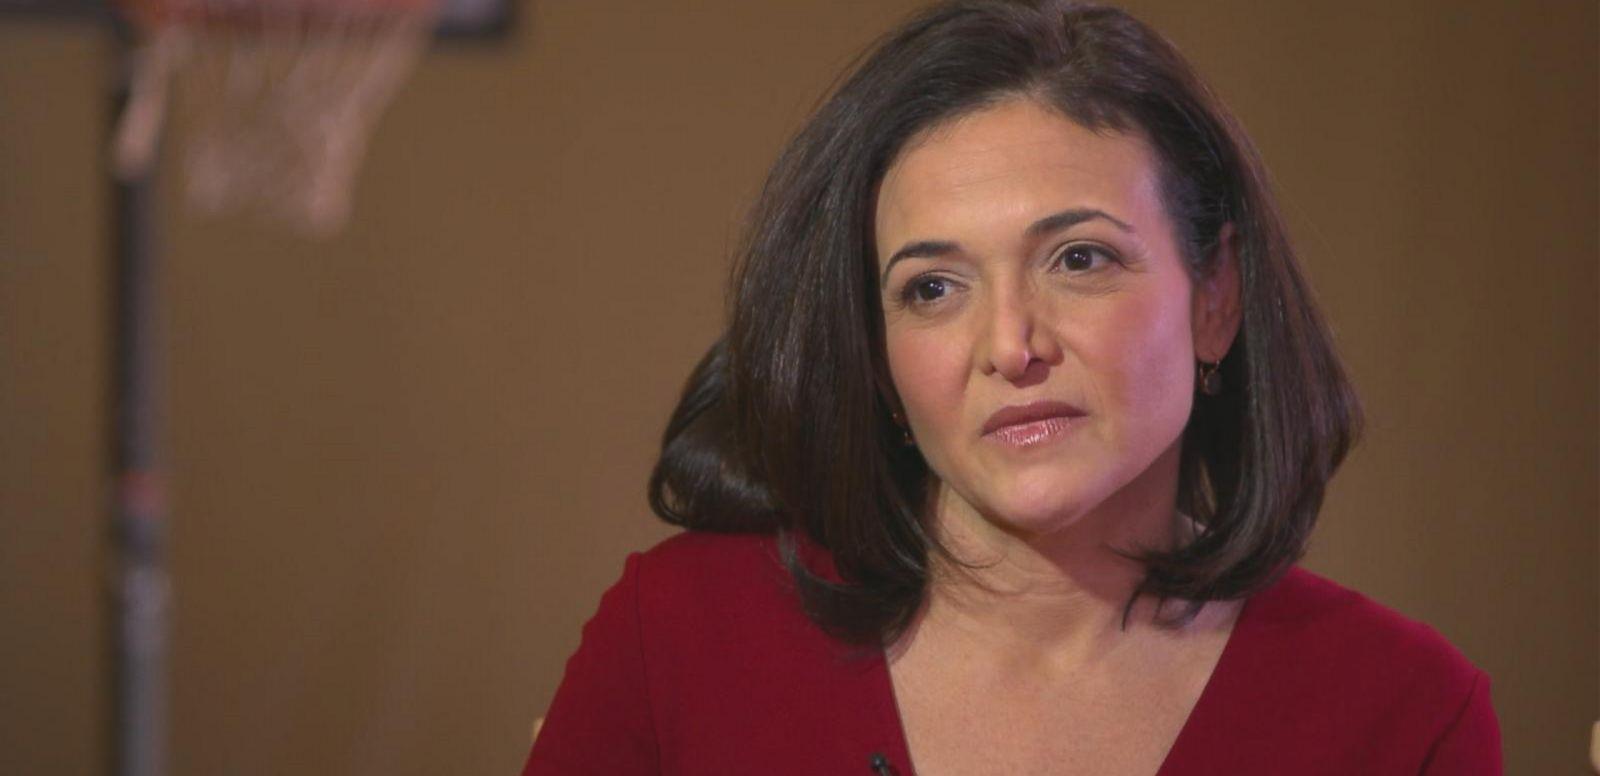 VIDEO: Sheryl Sandberg's Advice to Men: 'Lean In Together'